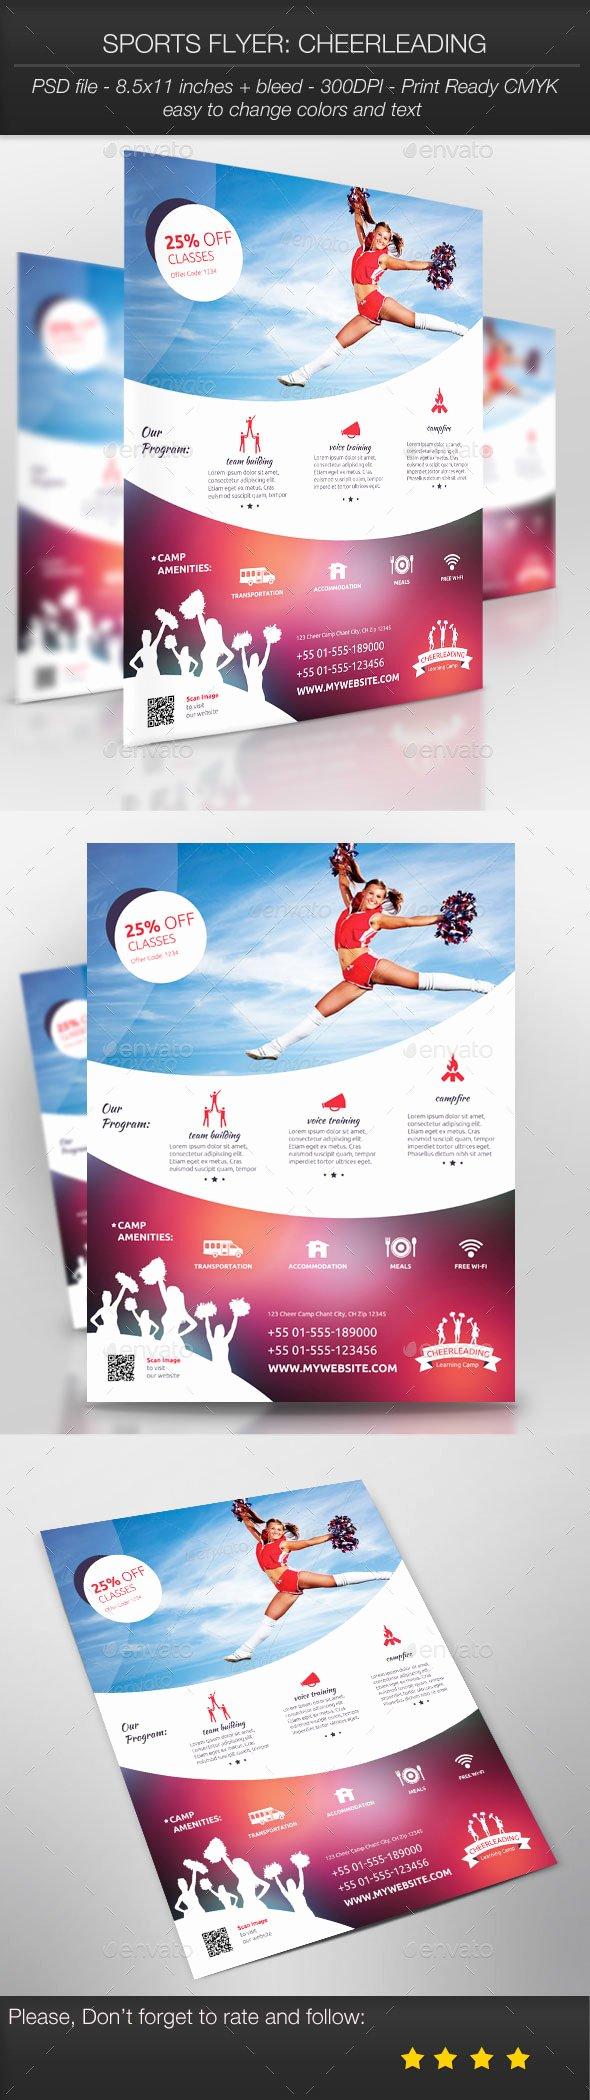 Cheerleading Registration form Template Unique Football and Cheerleading Registration Flyer Templates